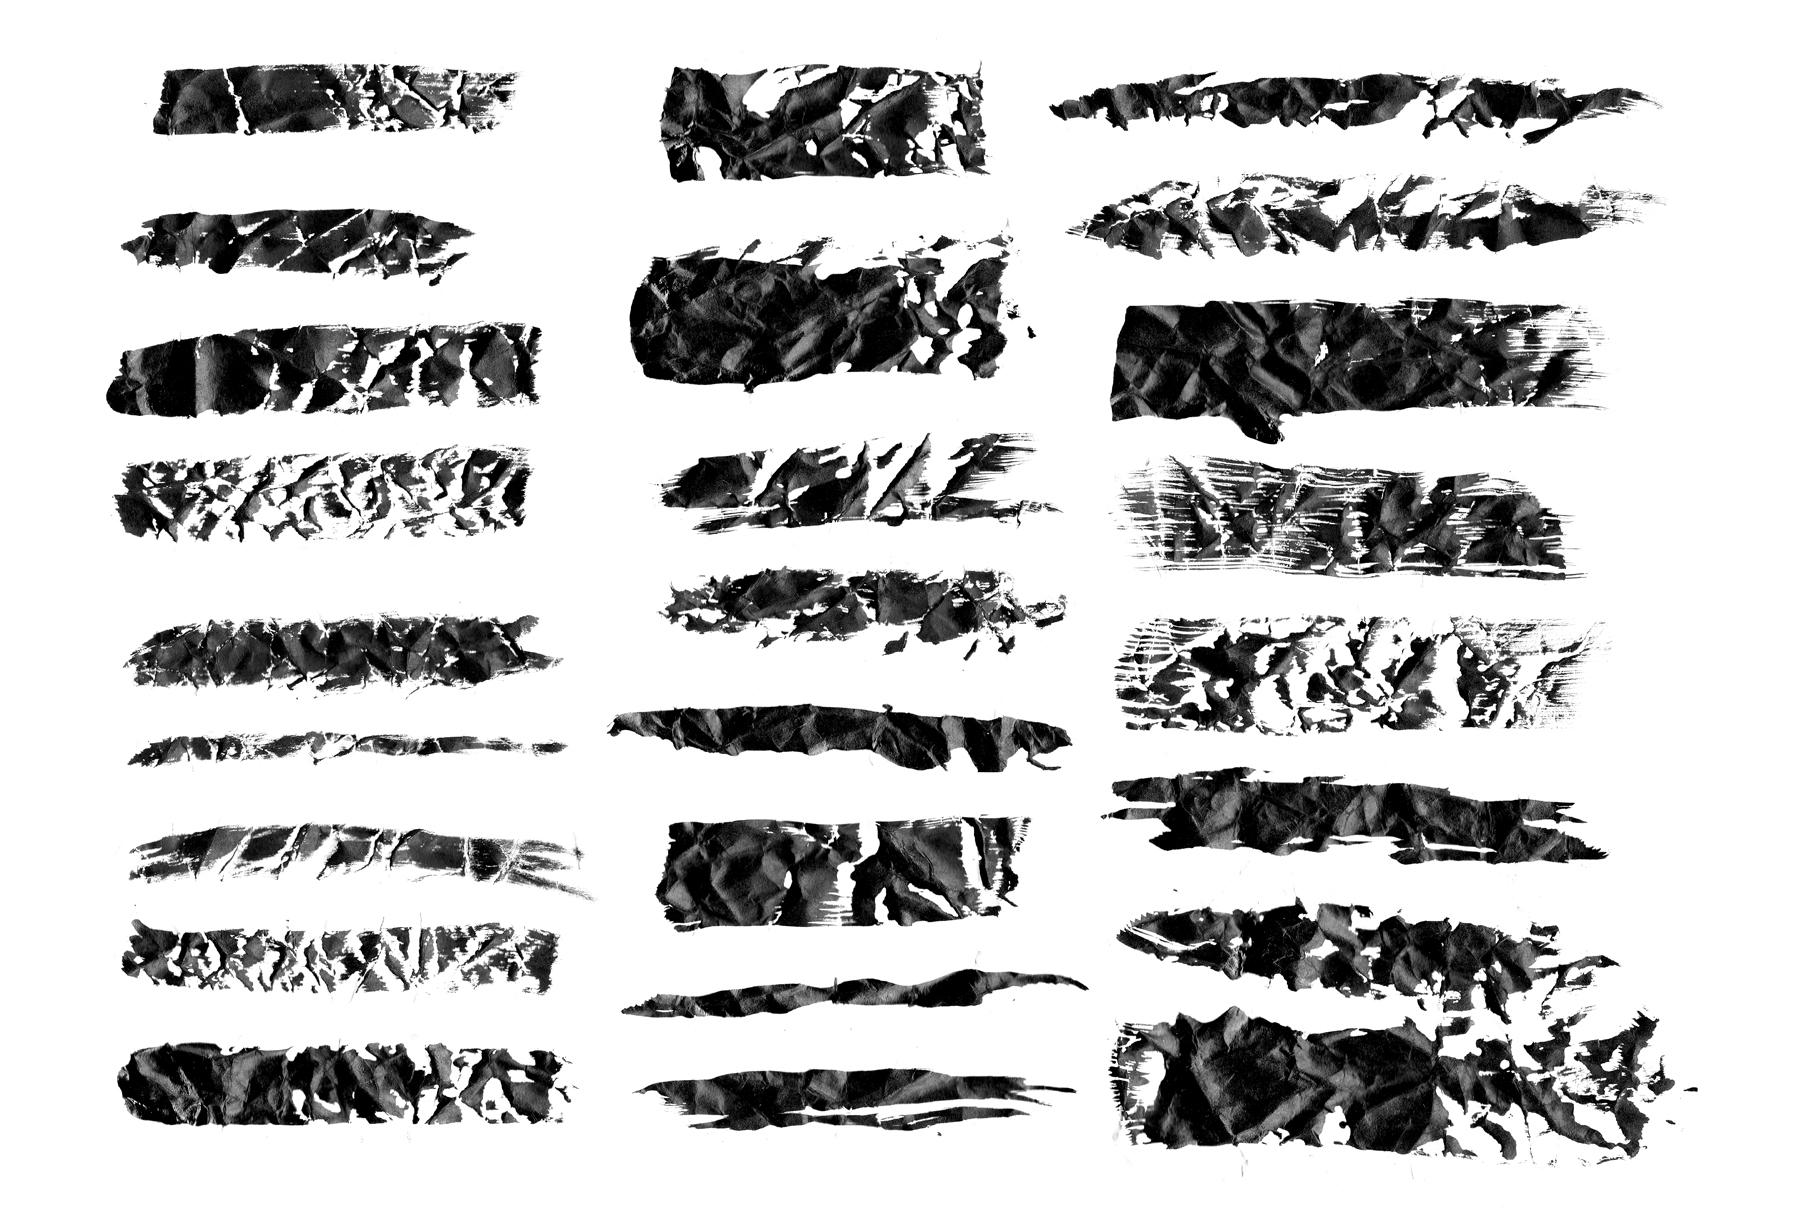 516 textures big set. example image 2